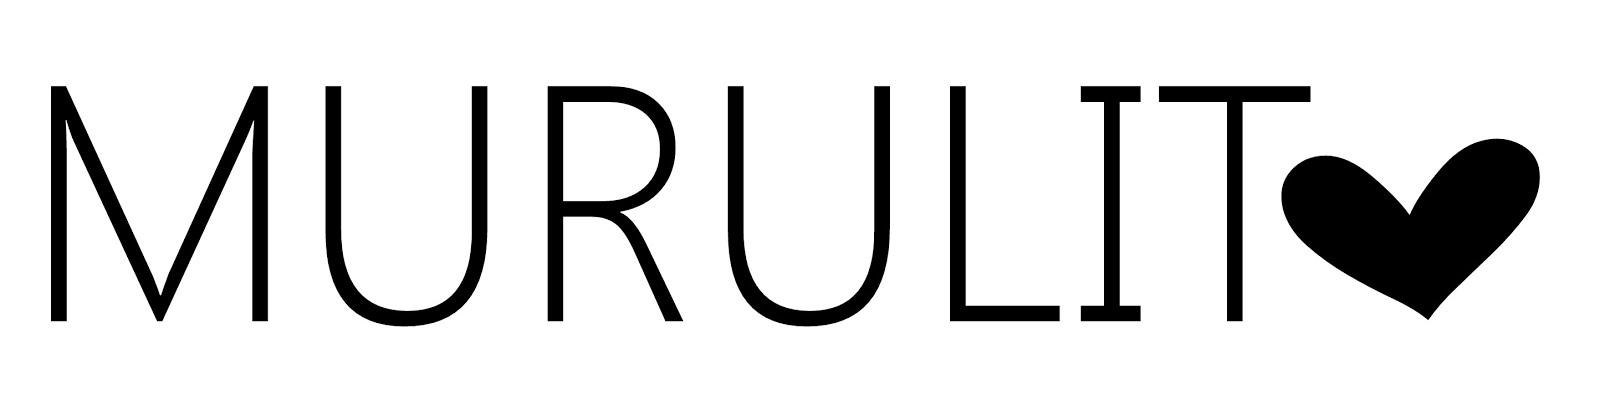 Murulit